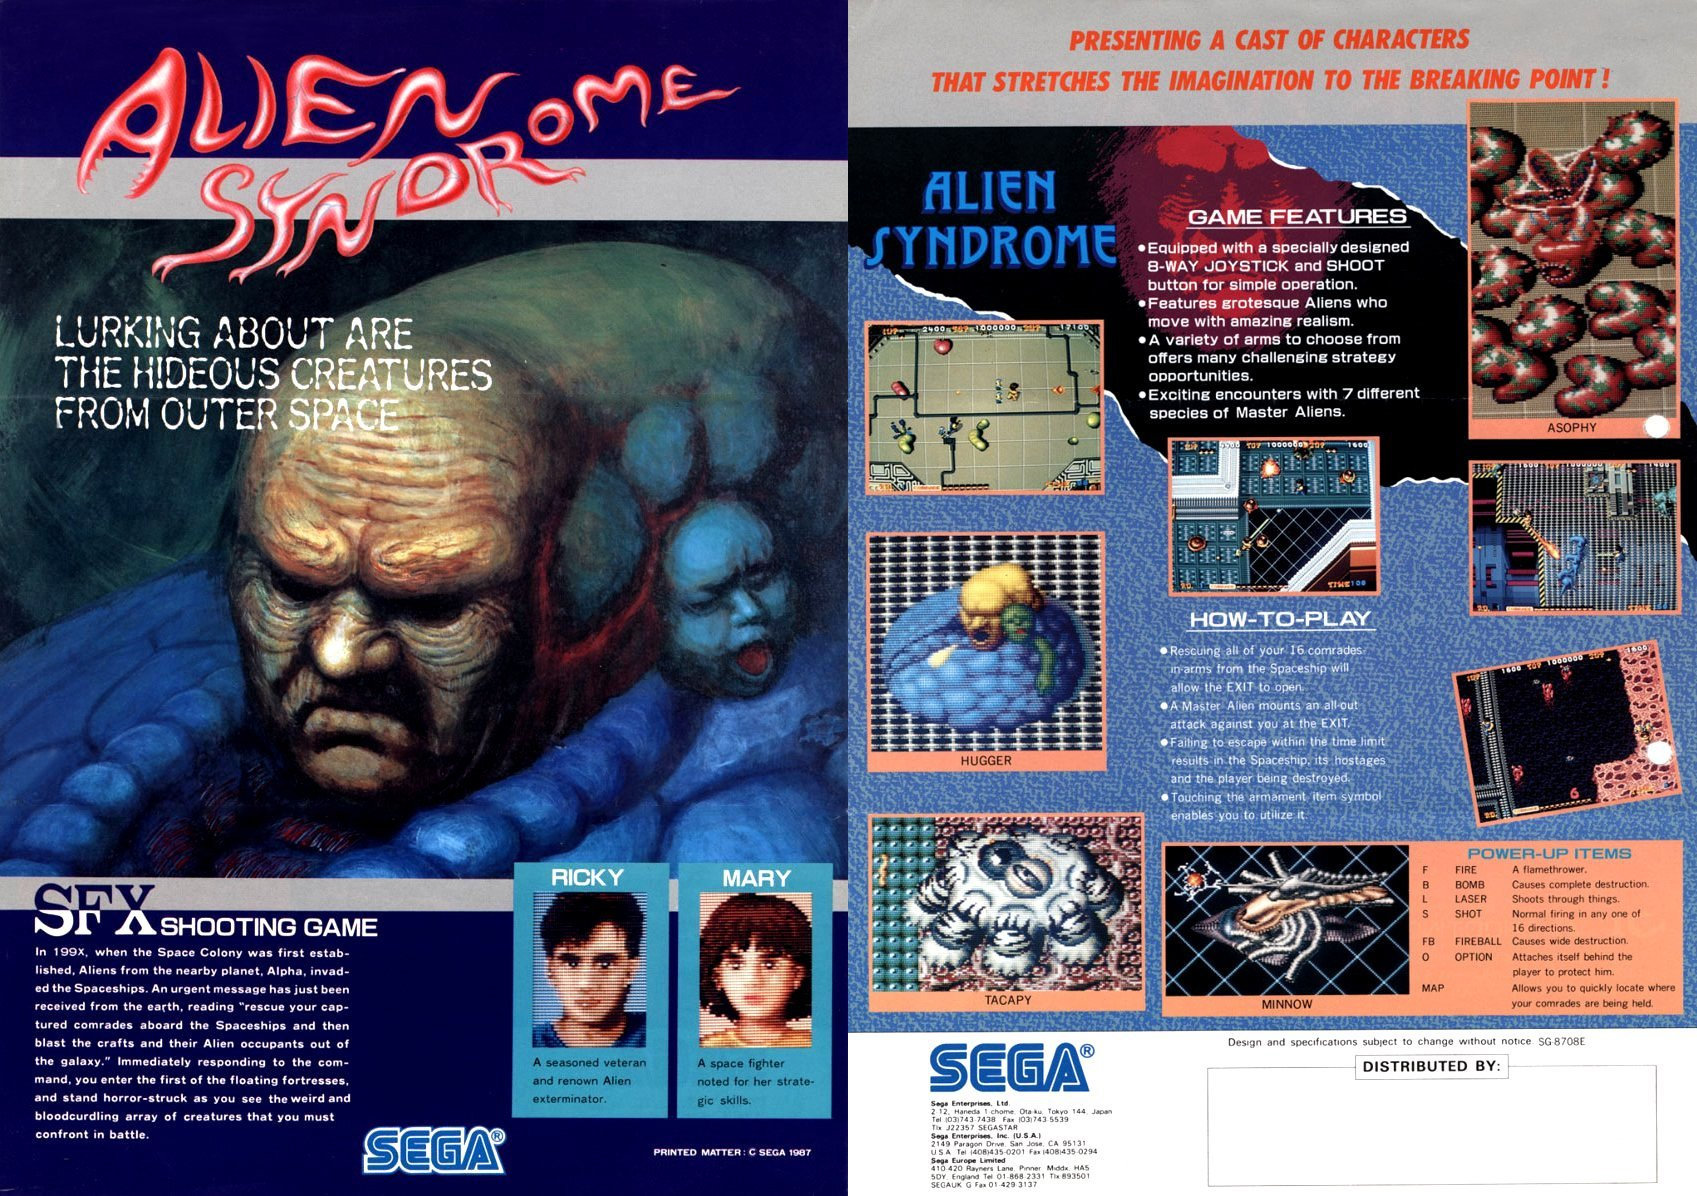 Alien Syndrome (1987)